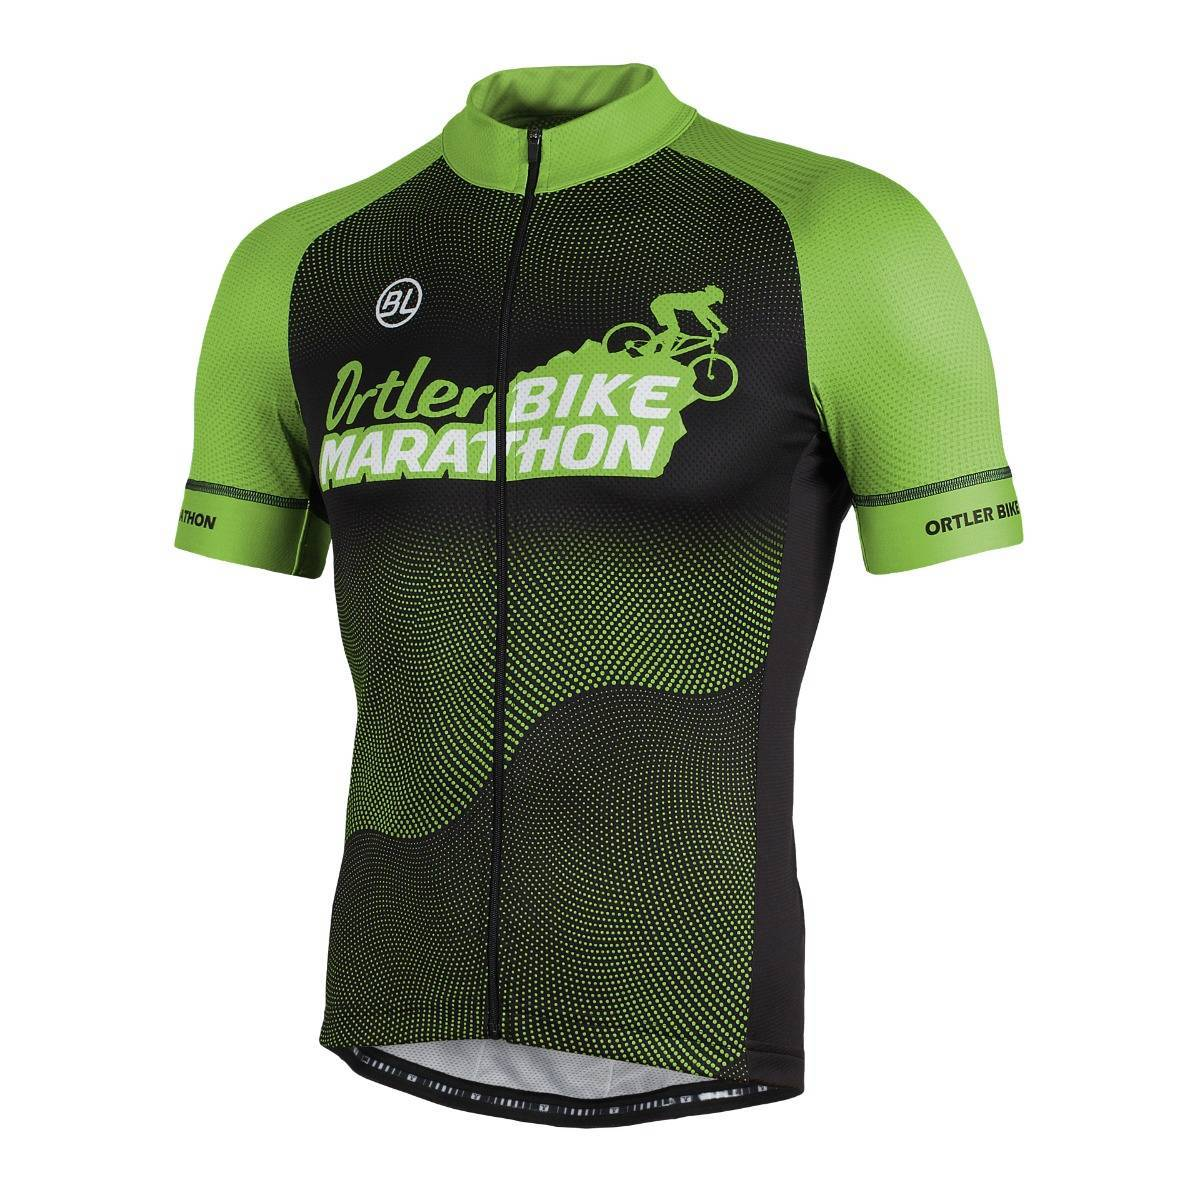 Maglia ufficiale Ortler Bike Marathon 2018 firmata Bicycle Line